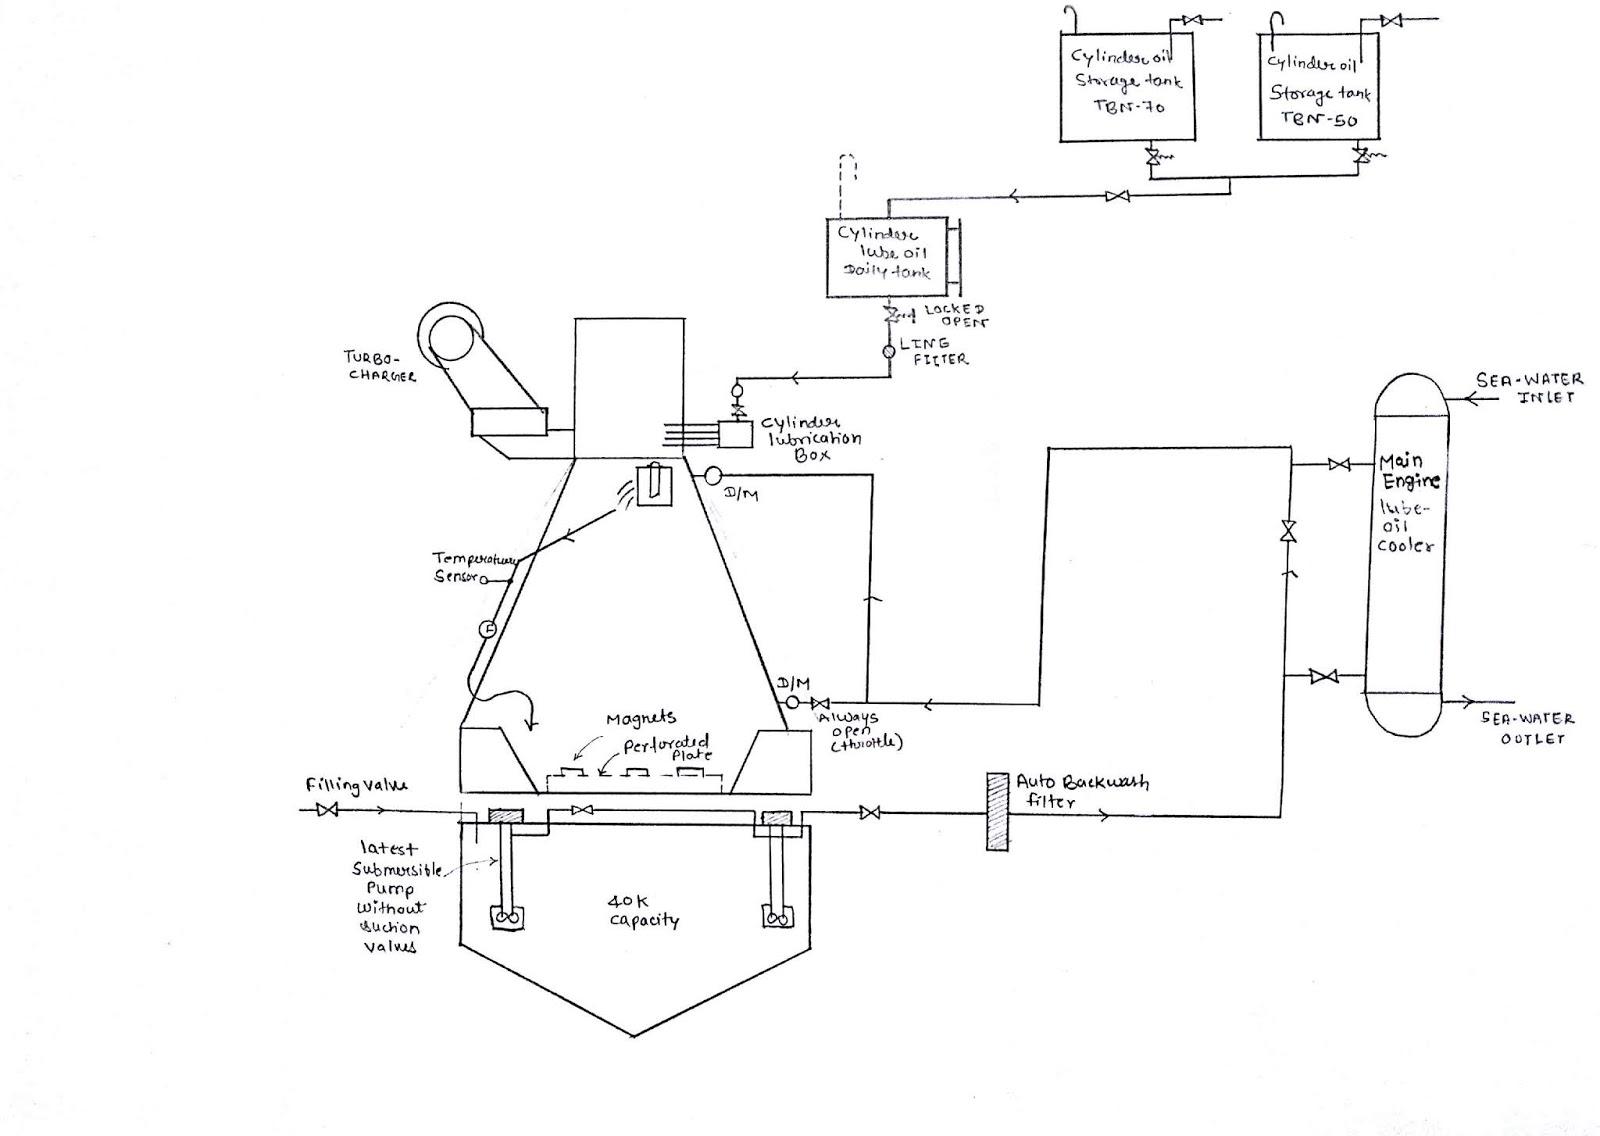 hight resolution of diagram of main engine